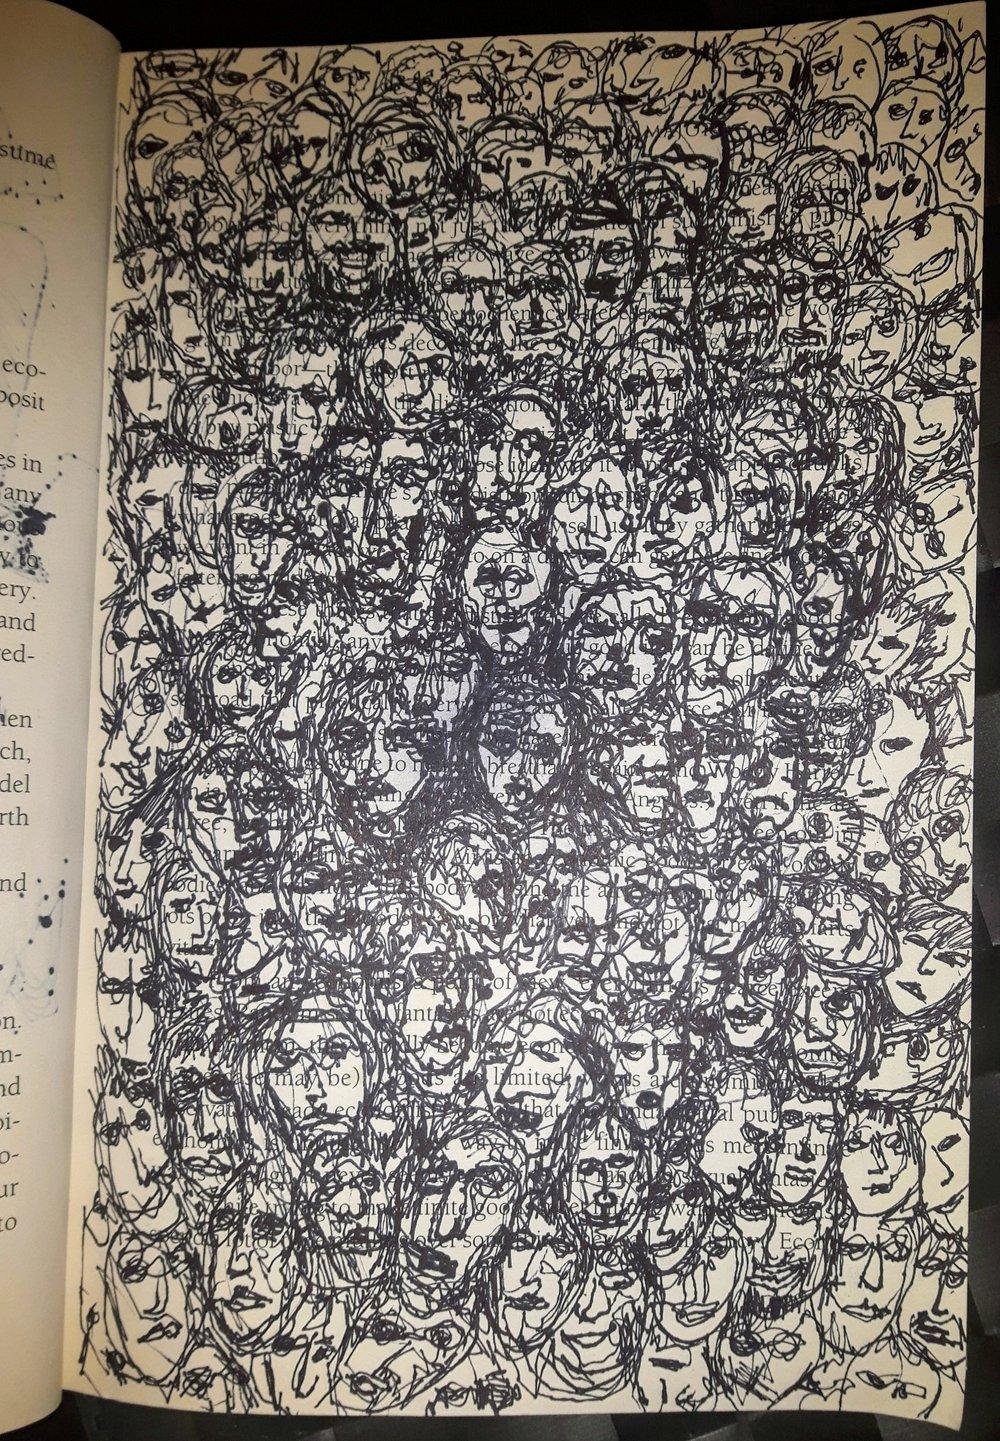 Sharpie on self help book, 6x9 in.